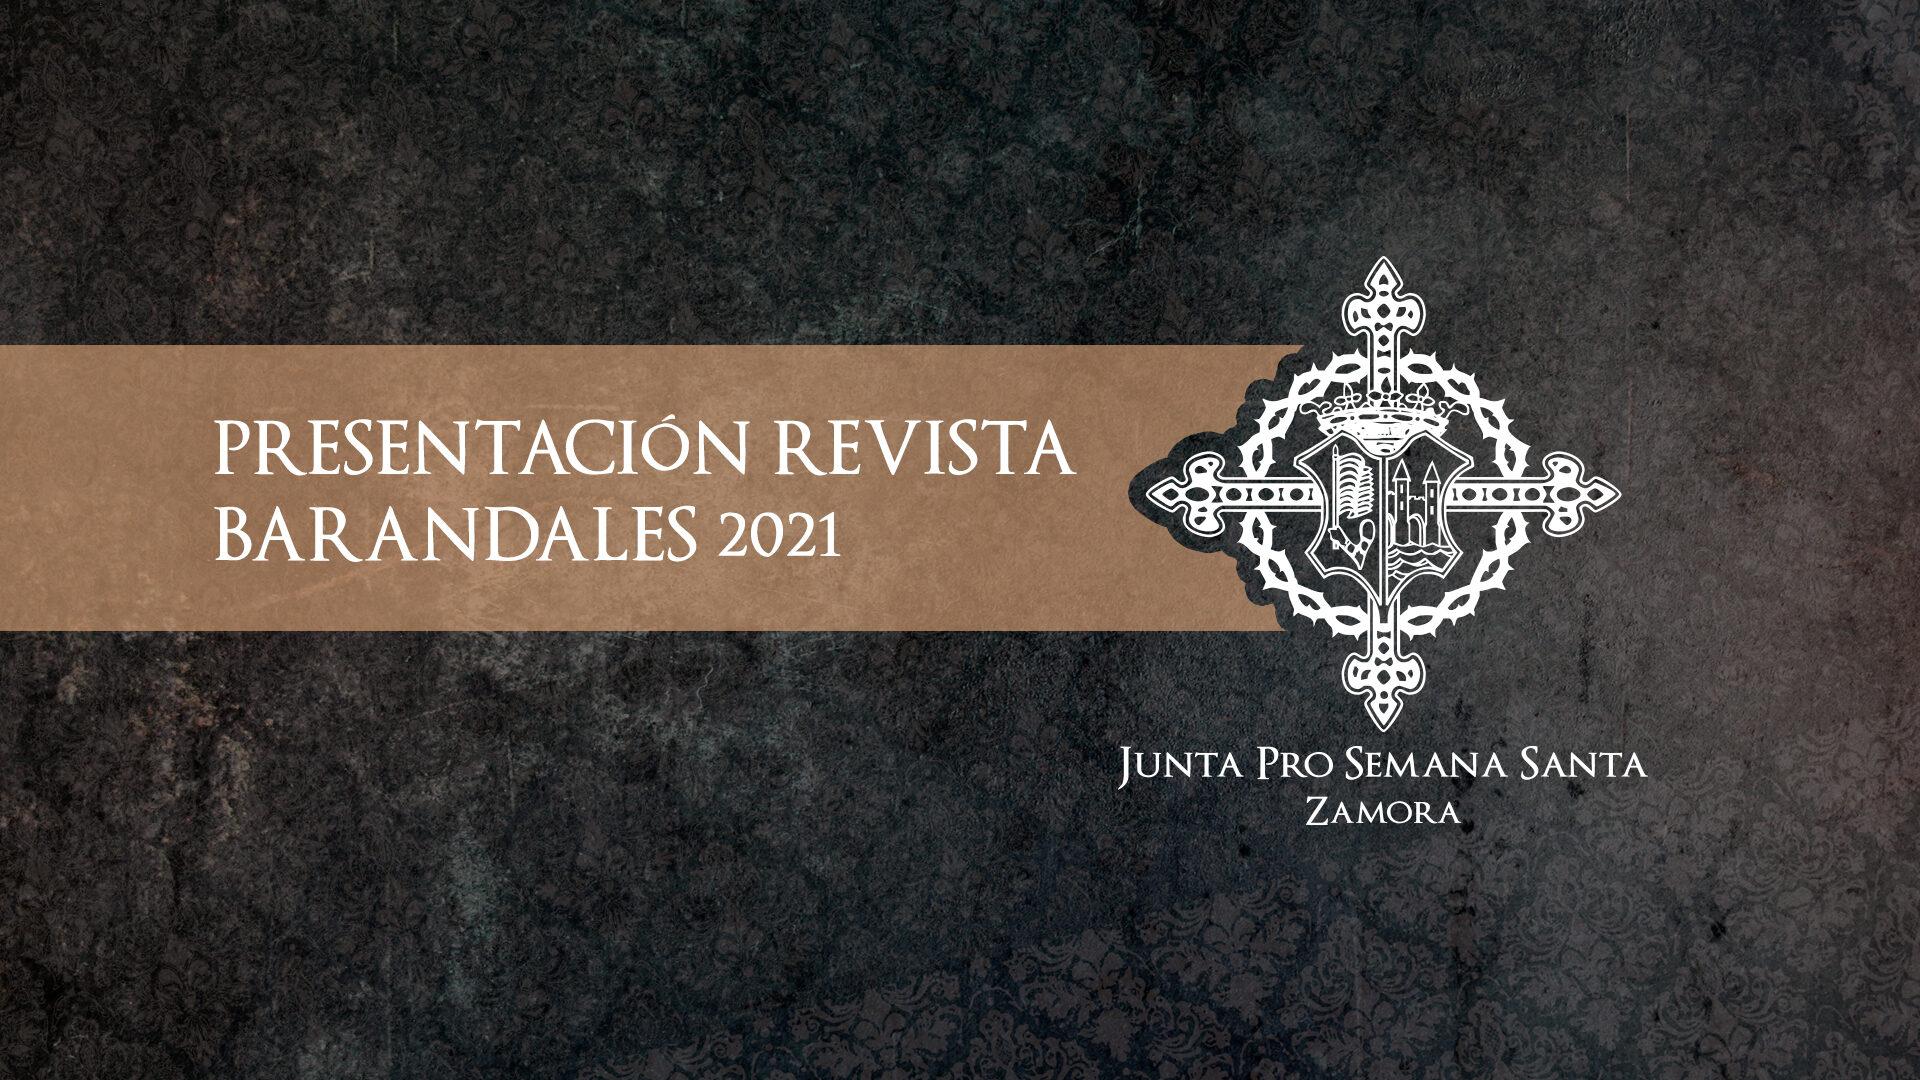 PRESENTACIÓN REVISTA BARANDALES 2021